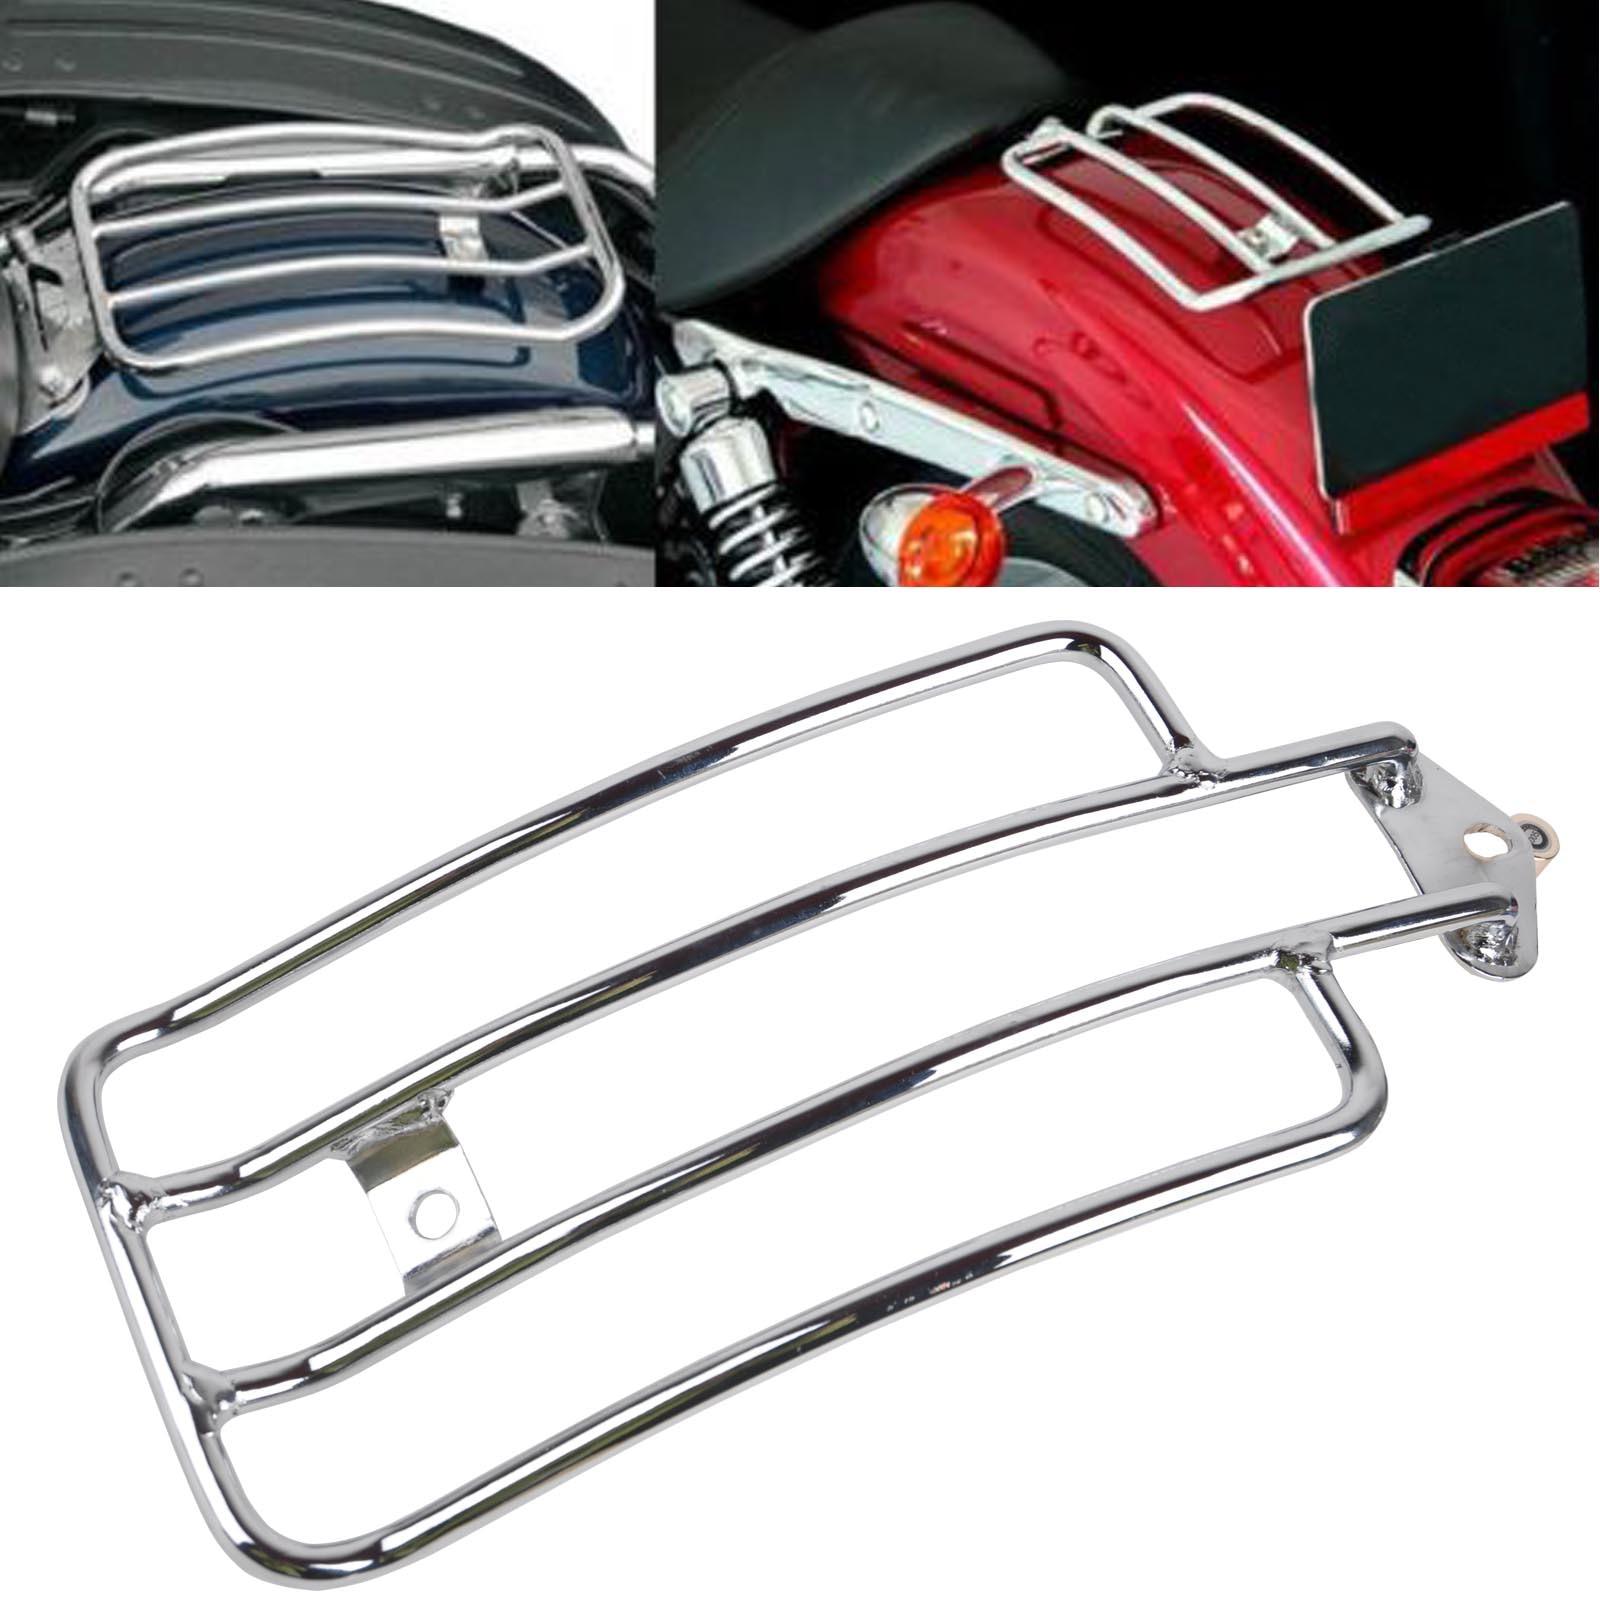 High Grade Metal Steel Solo Seat Rear Fender Luggage Rack Sportster Support Shelf for Harley Honda Yamaha Kawasaki Suzuki<br>